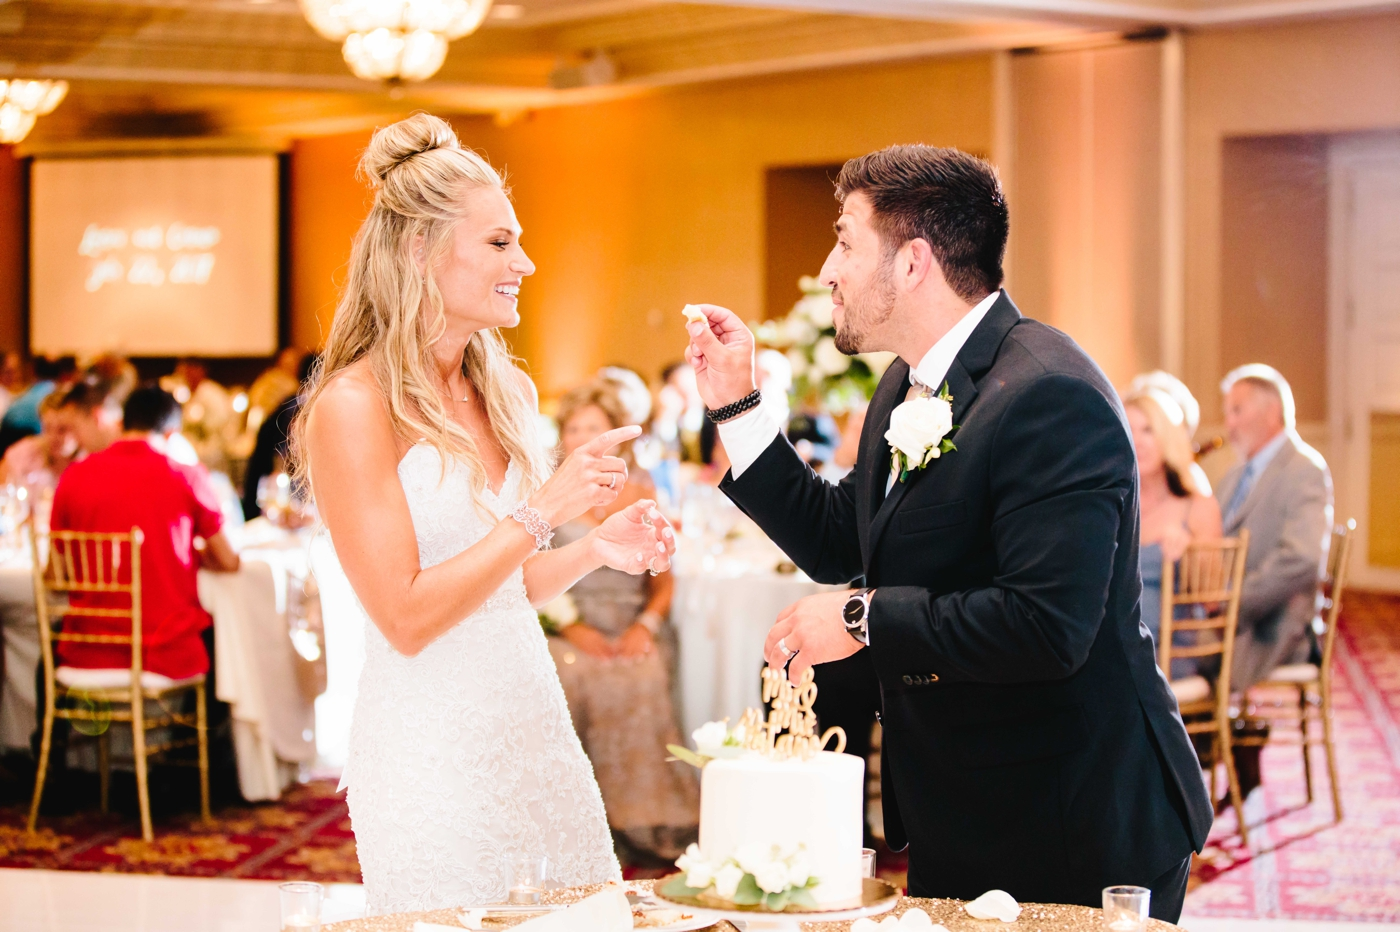 chicago-fine-art-wedding-photography-patano45